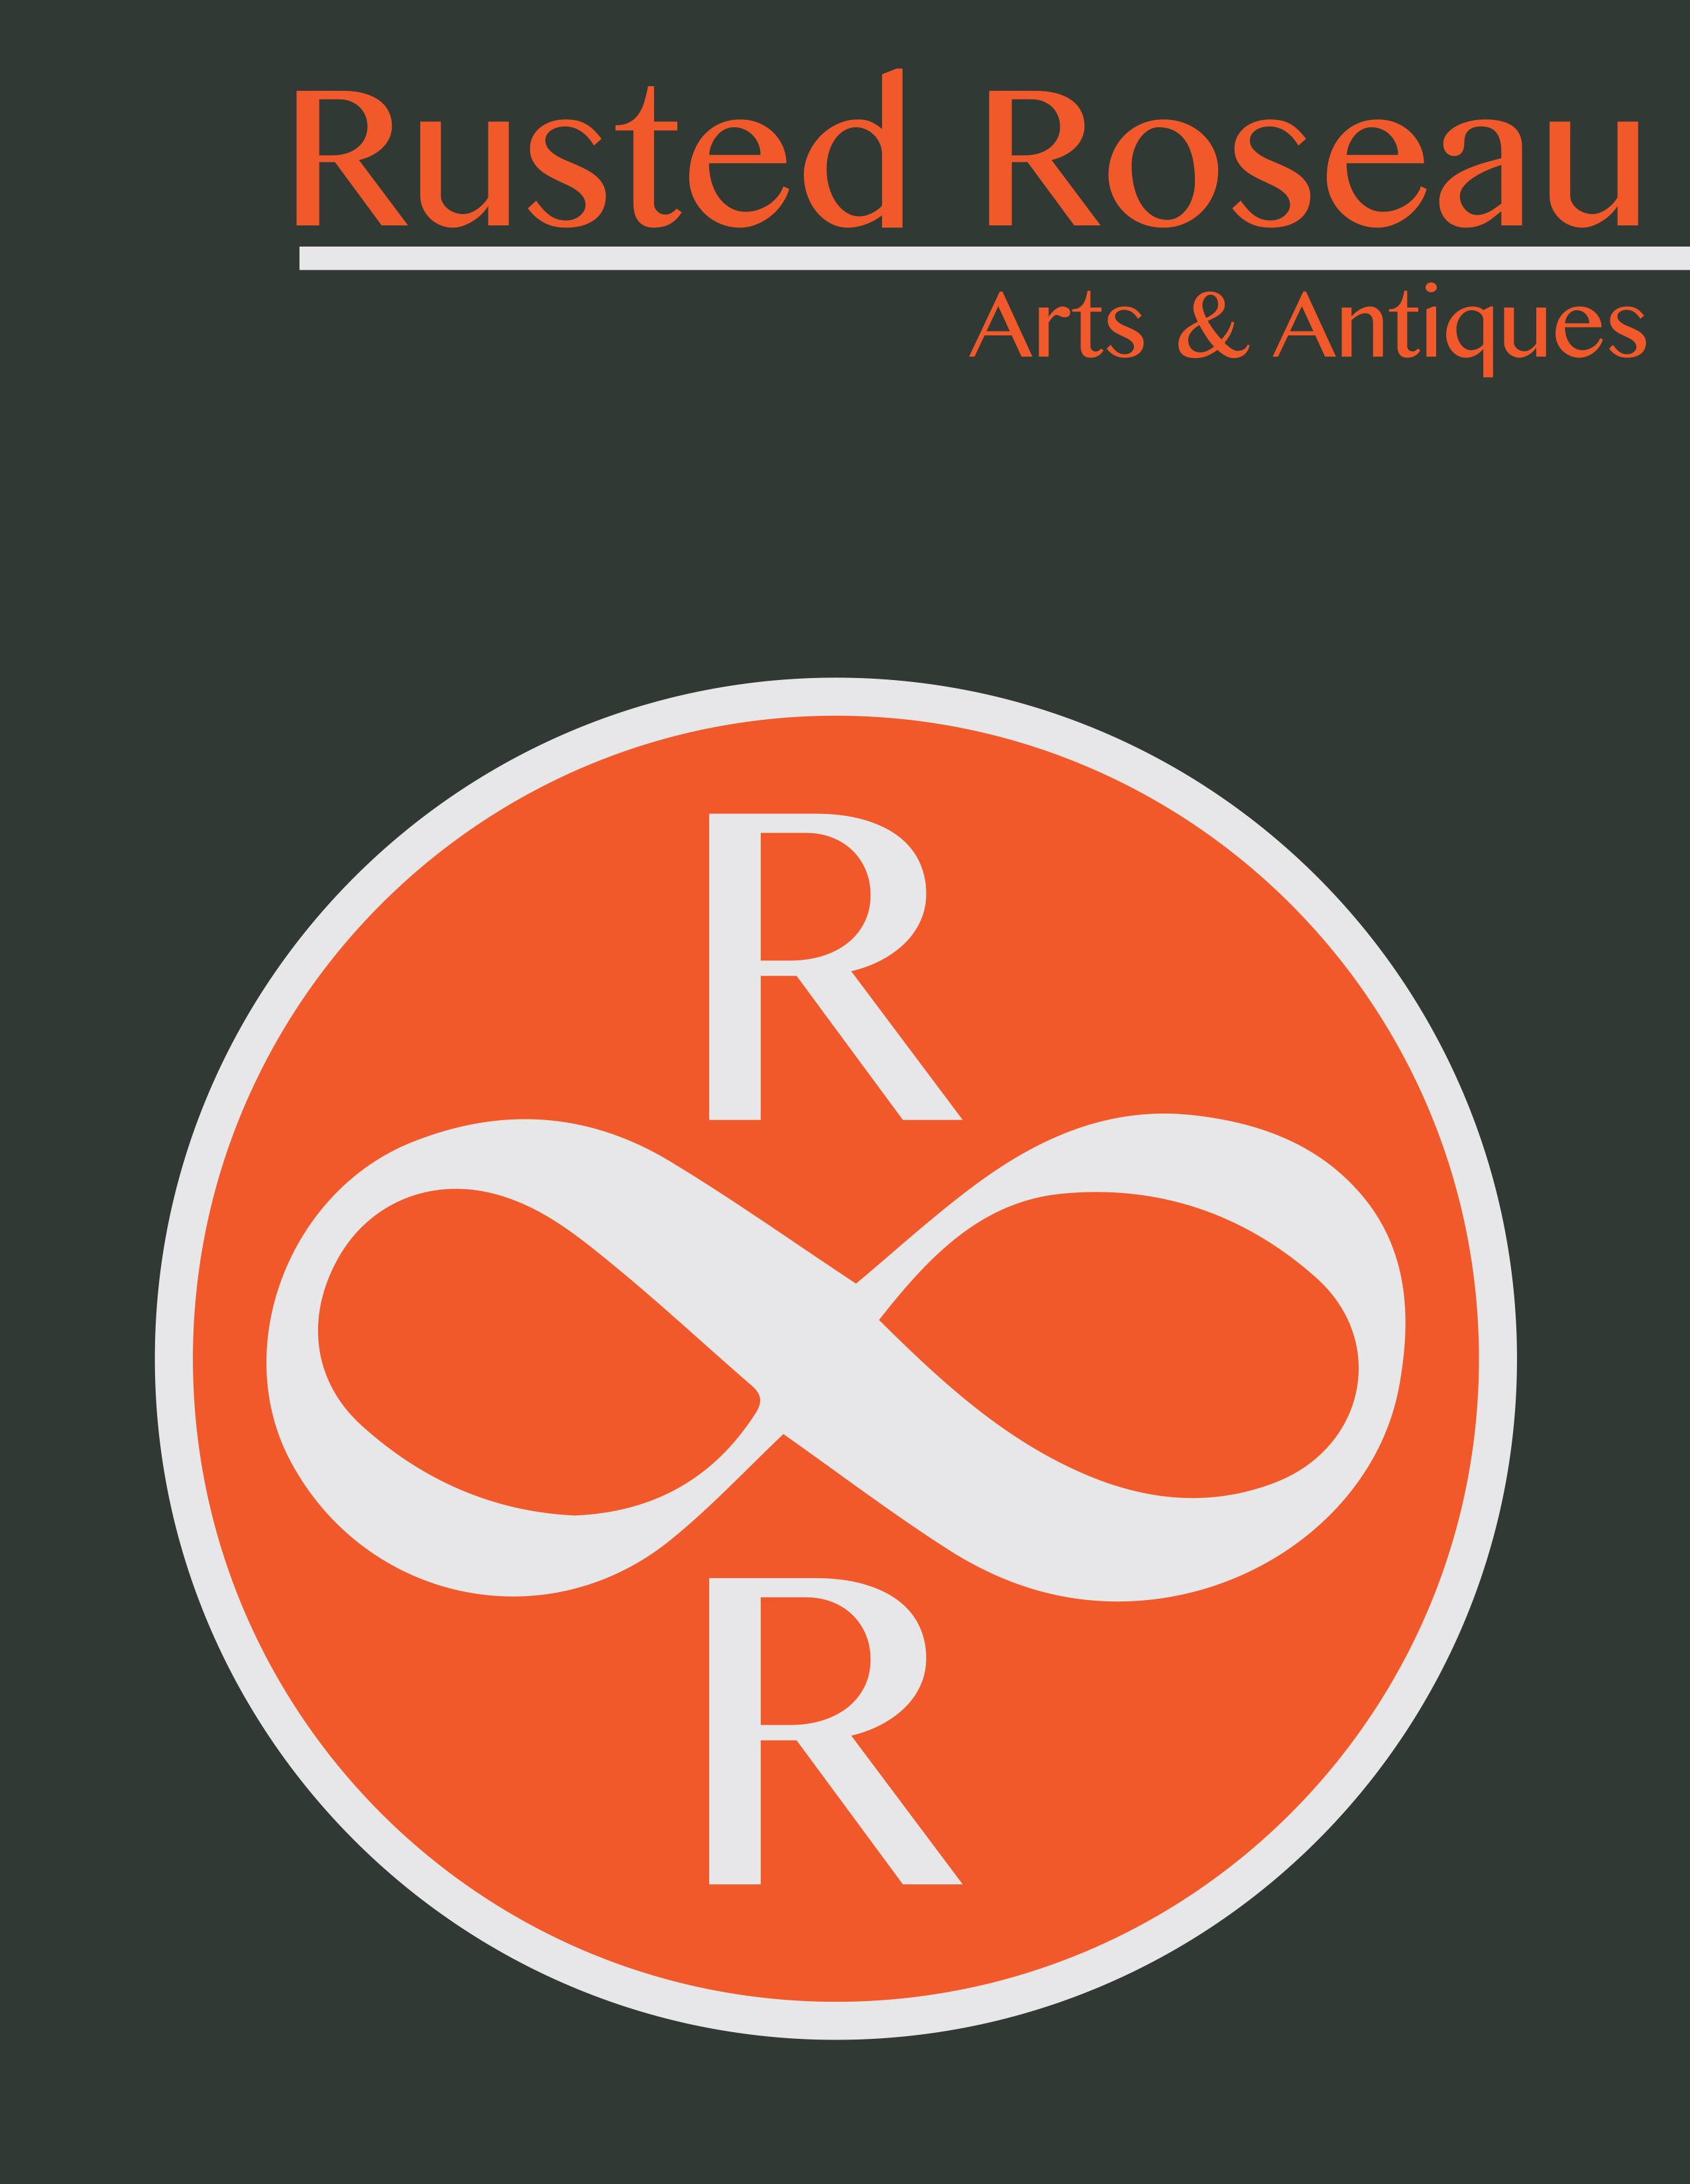 rusted-rouseau-2a.jpg